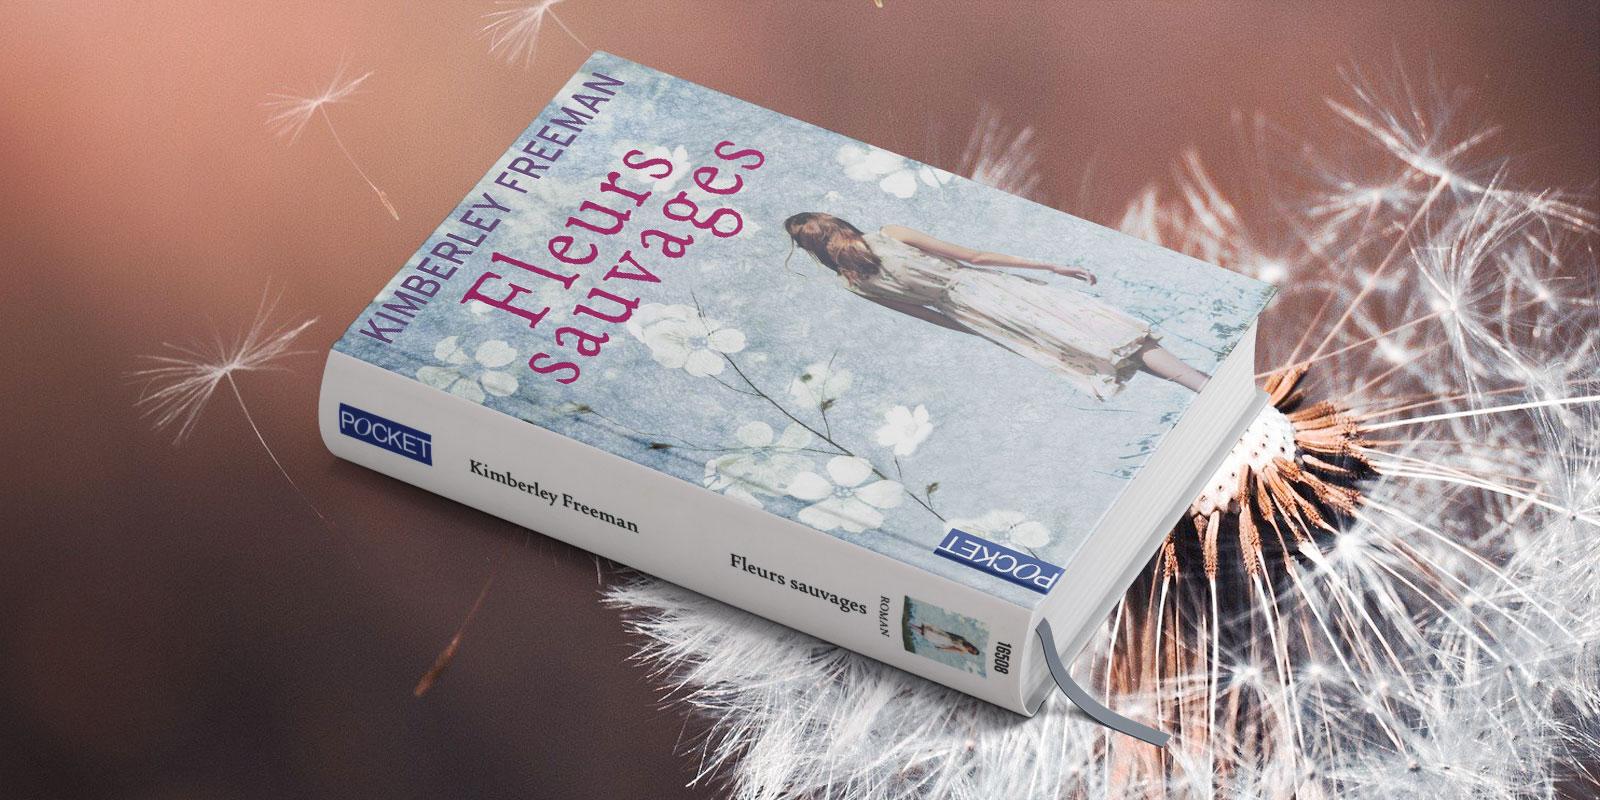 Fleurs sauvages, un roman de Kimberley Freeman